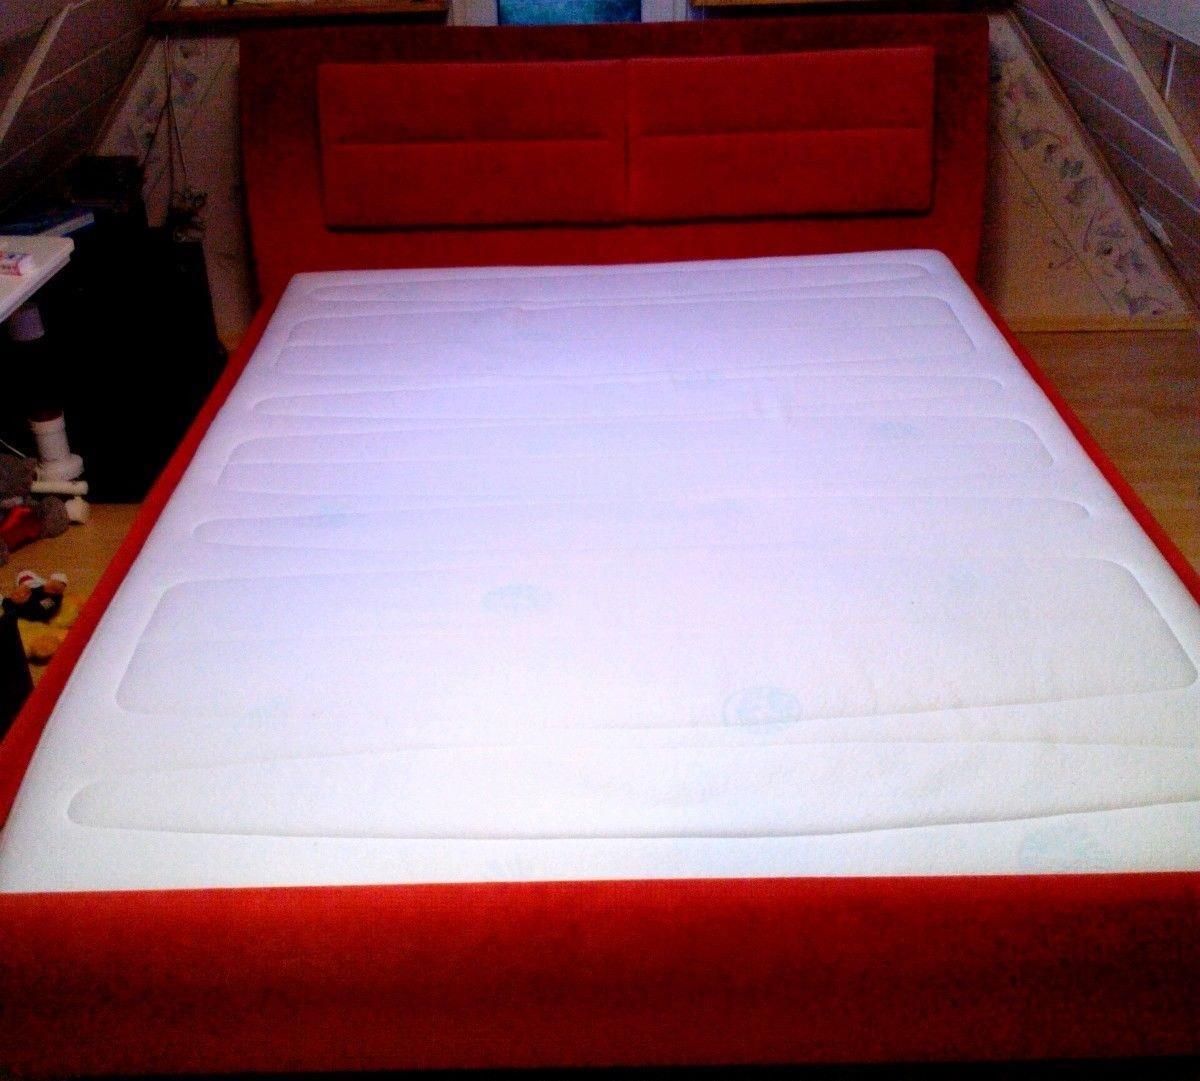 Full Size of Bett 200x180 Transportkosten Und Preise Fr Mbel Mit Lattenrost Stauraum 160x200 Betten Massivholz Prinzessinen Amerikanische Sofa Bettfunktion Gästebett Bett Bett 200x180